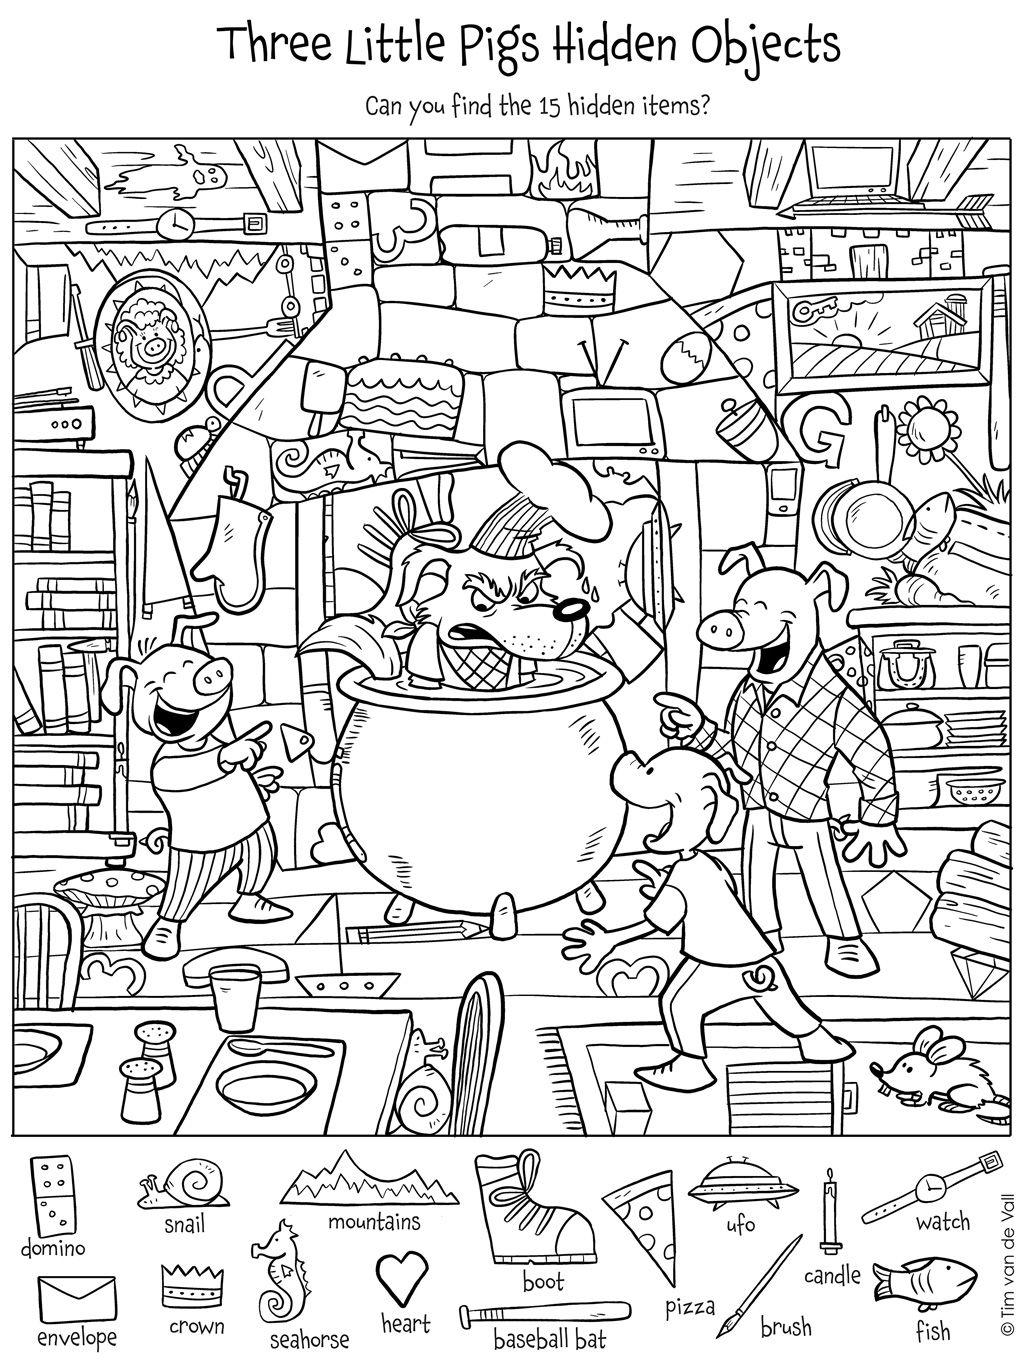 Three-Little-Pigs-Hidden-Objects.jpg 1,023×1,364 pixels